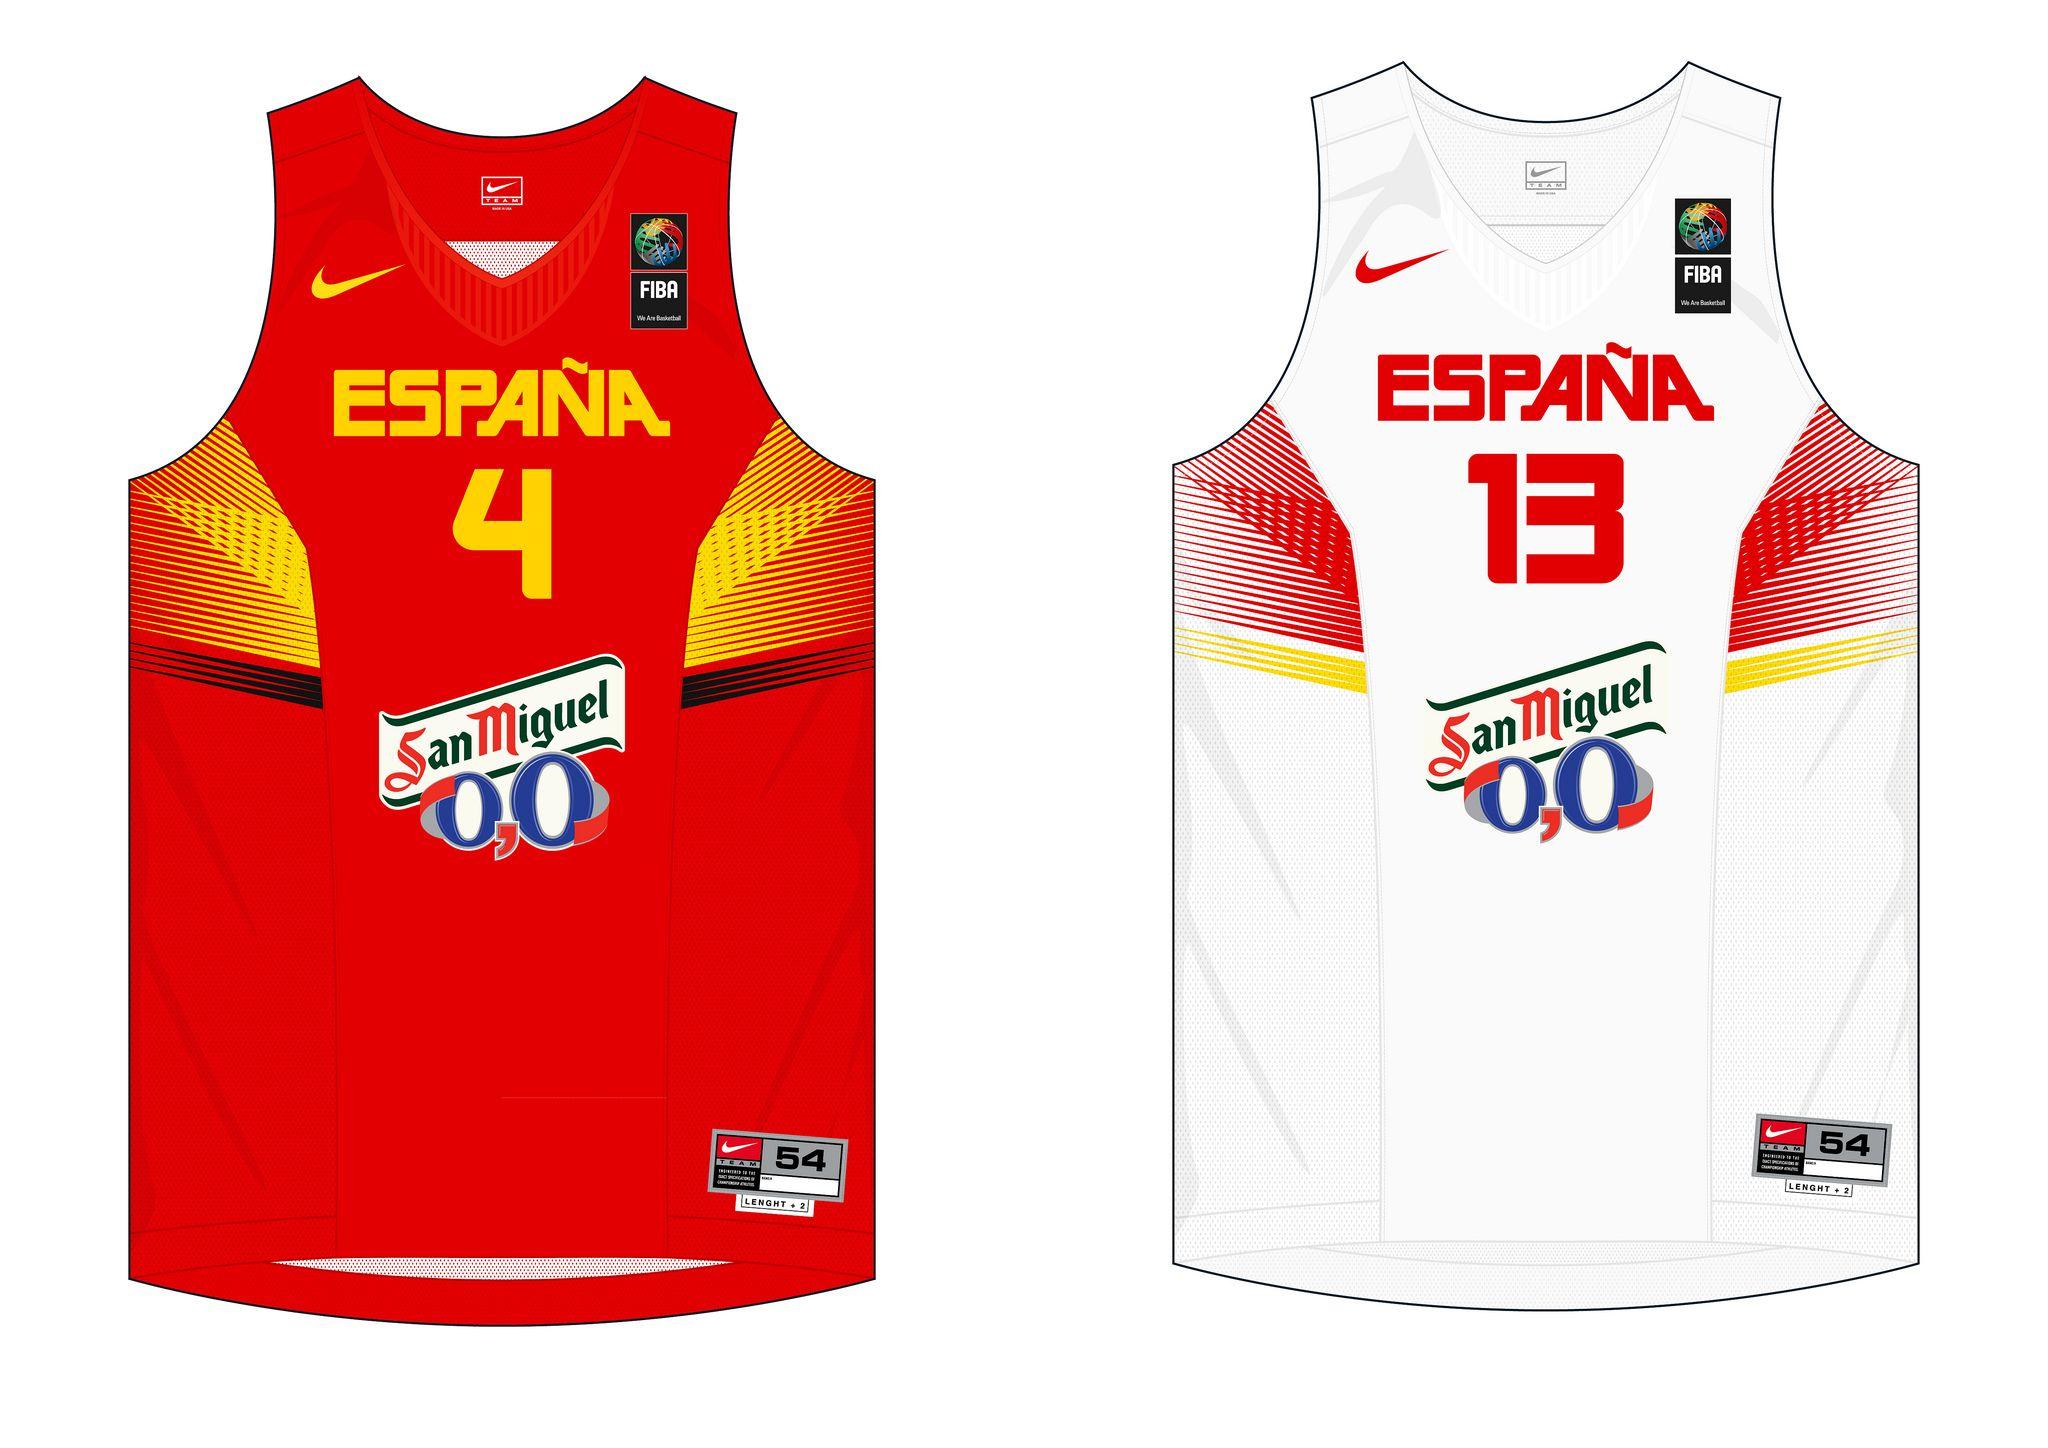 on sale 35219 7fae8 Spain National Team jersey (FIBA World Championship 2014 ...